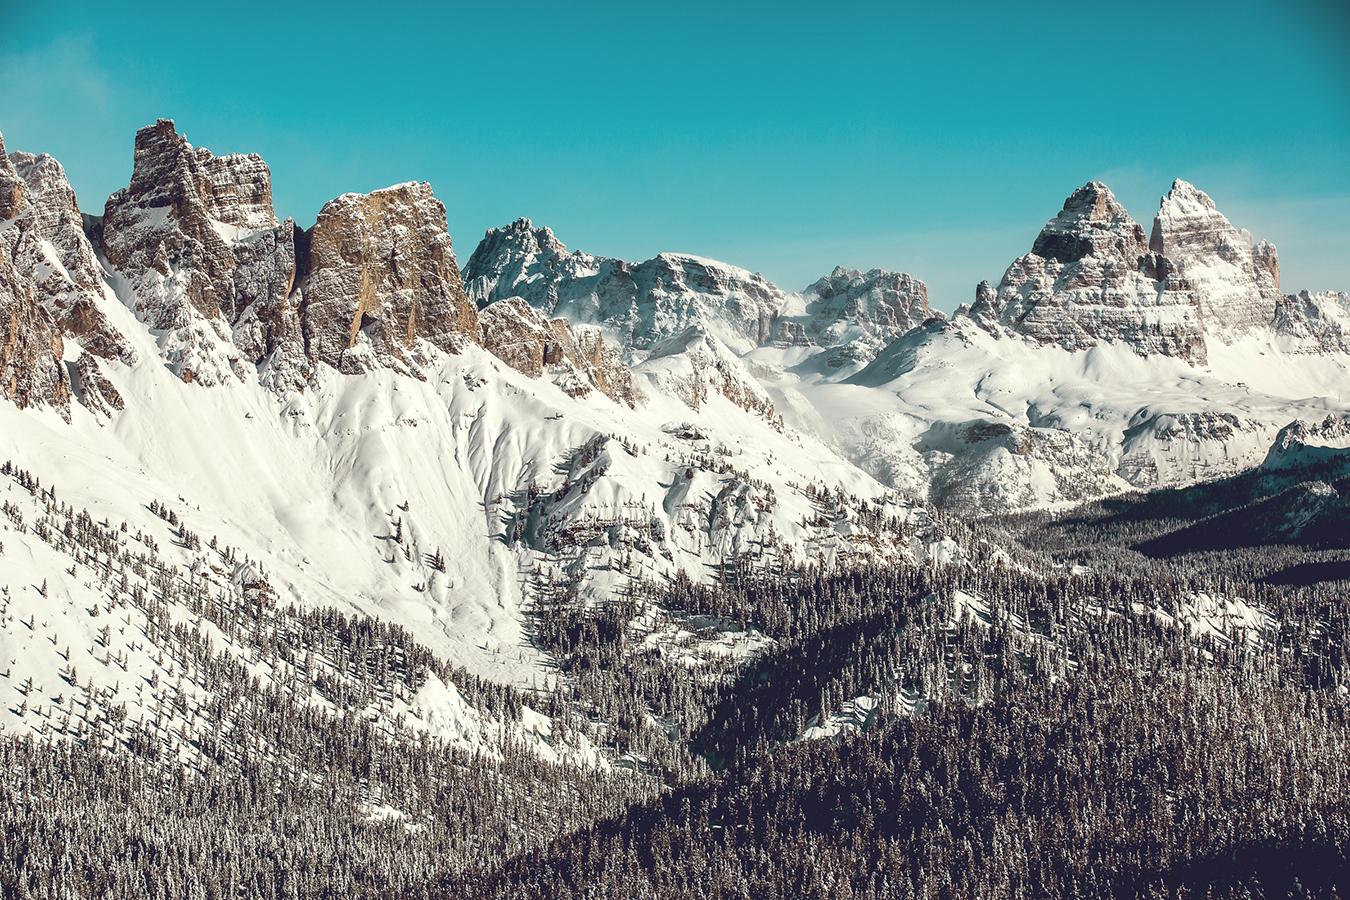 Italy_Mountains_Landscape_Cortina_SilvanoZeiter.jpg